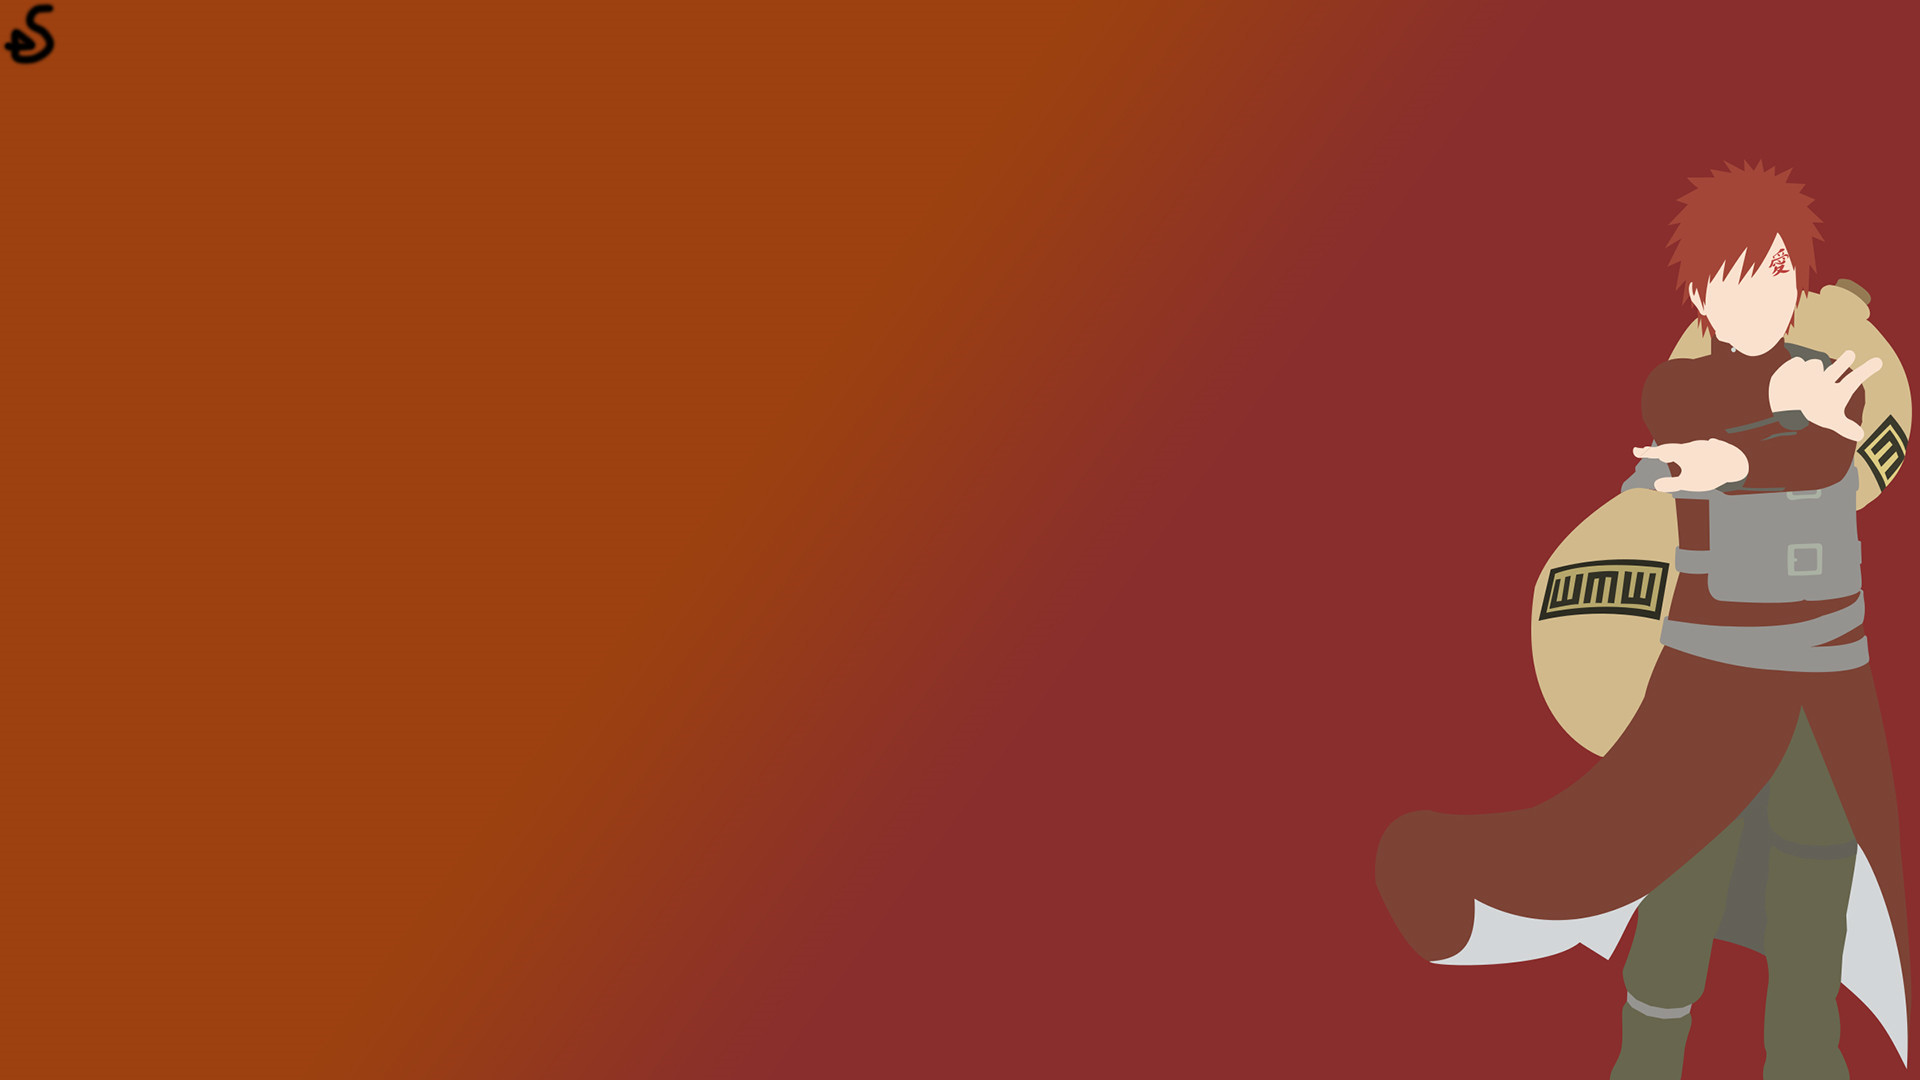 Konan God Mode (Naruto) Minimalist Wallpaper by slezzy7 on DeviantArt |  Minimalism | Pinterest | Minimalist wallpaper, Naruto and Minimalist